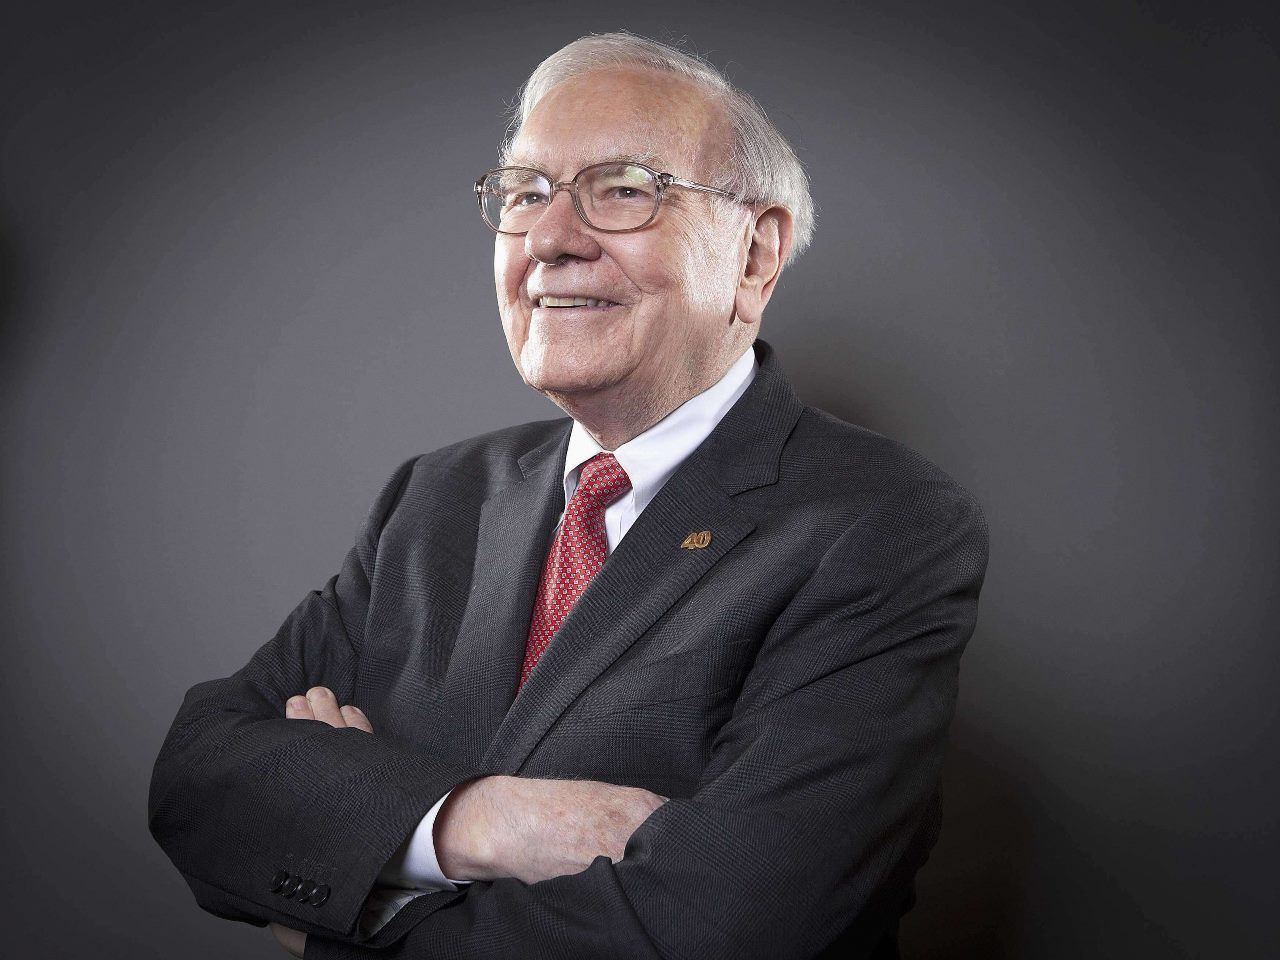 Warren Buffett donated 26 billion dollars ($26bn)  | World's Biggest Donation